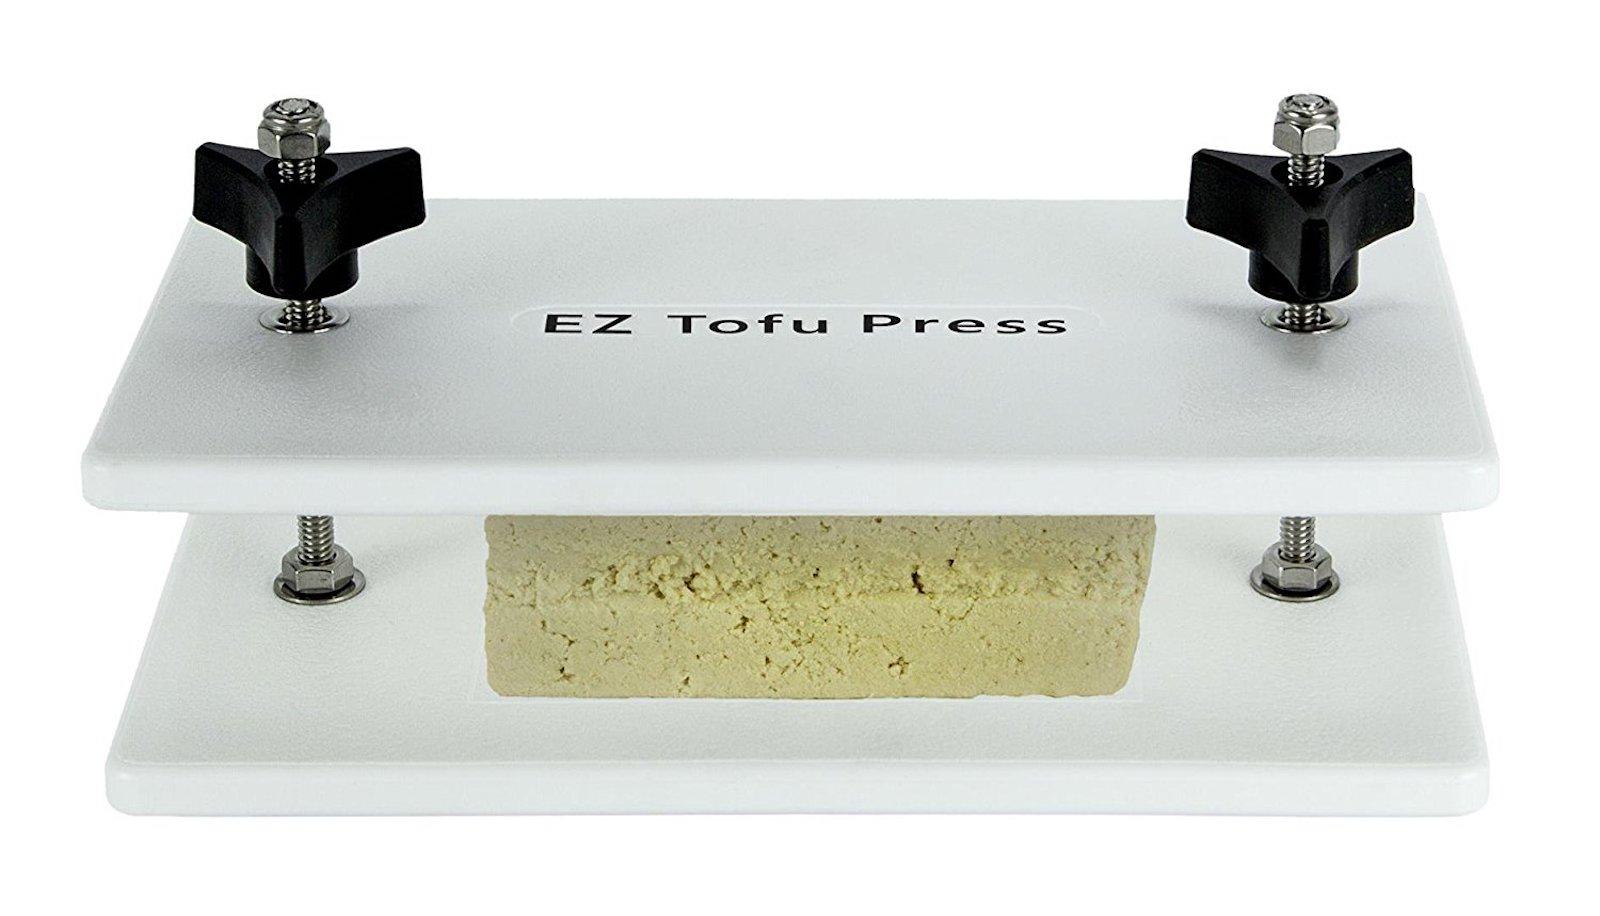 ex tofu press with plate